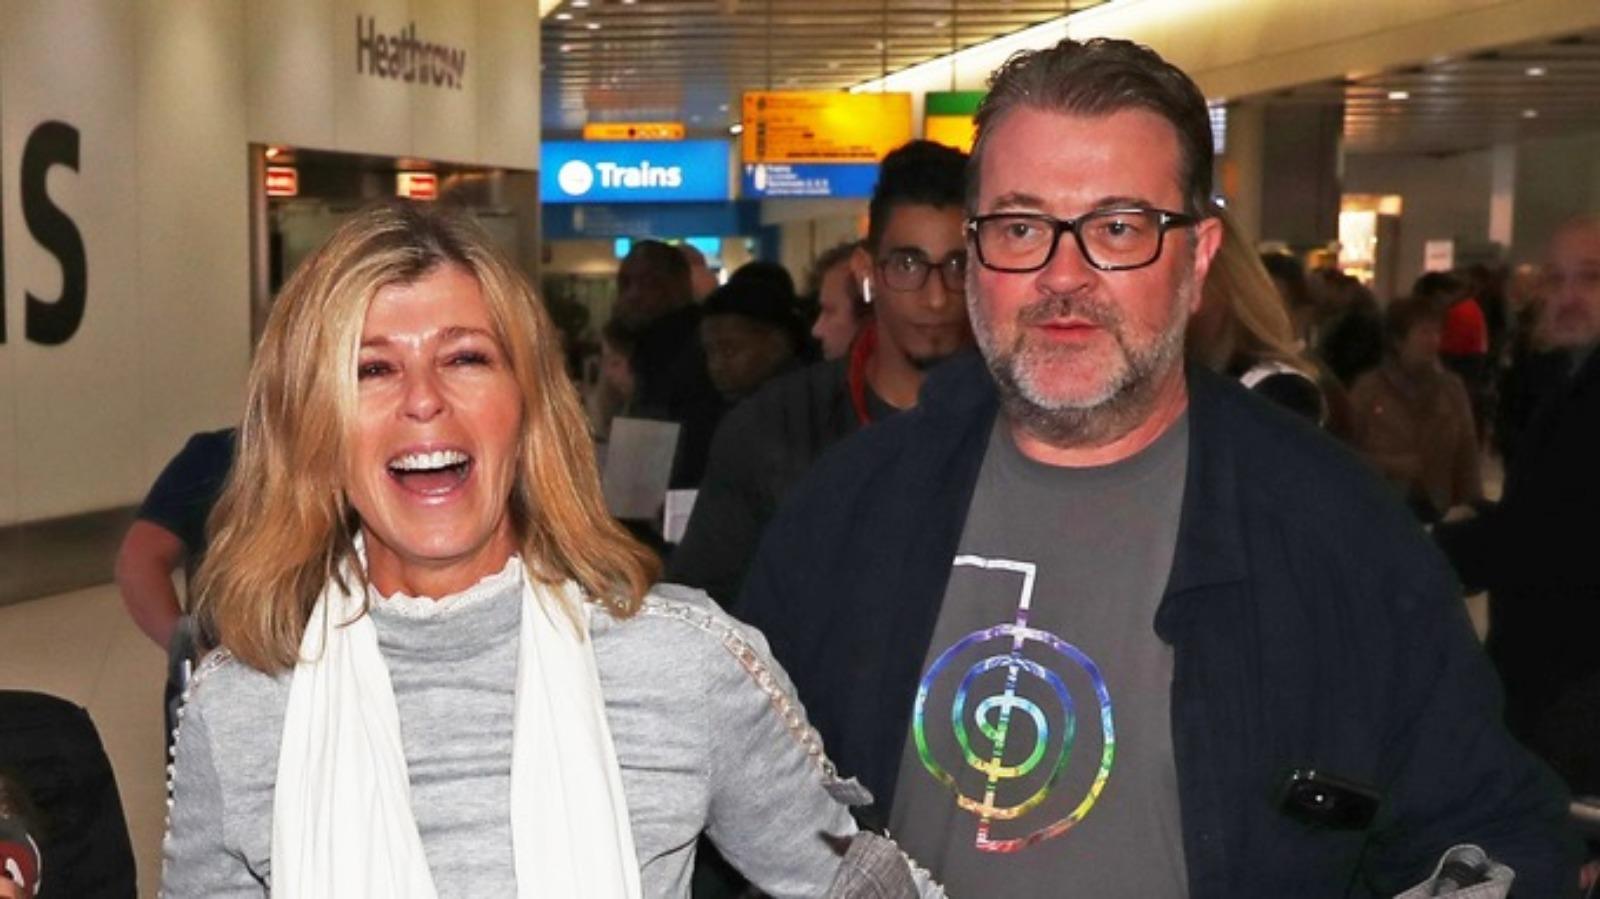 Kate Garraway S Husband Fighting Hard As He Remains Hospitalised From Coronavirus Itv News